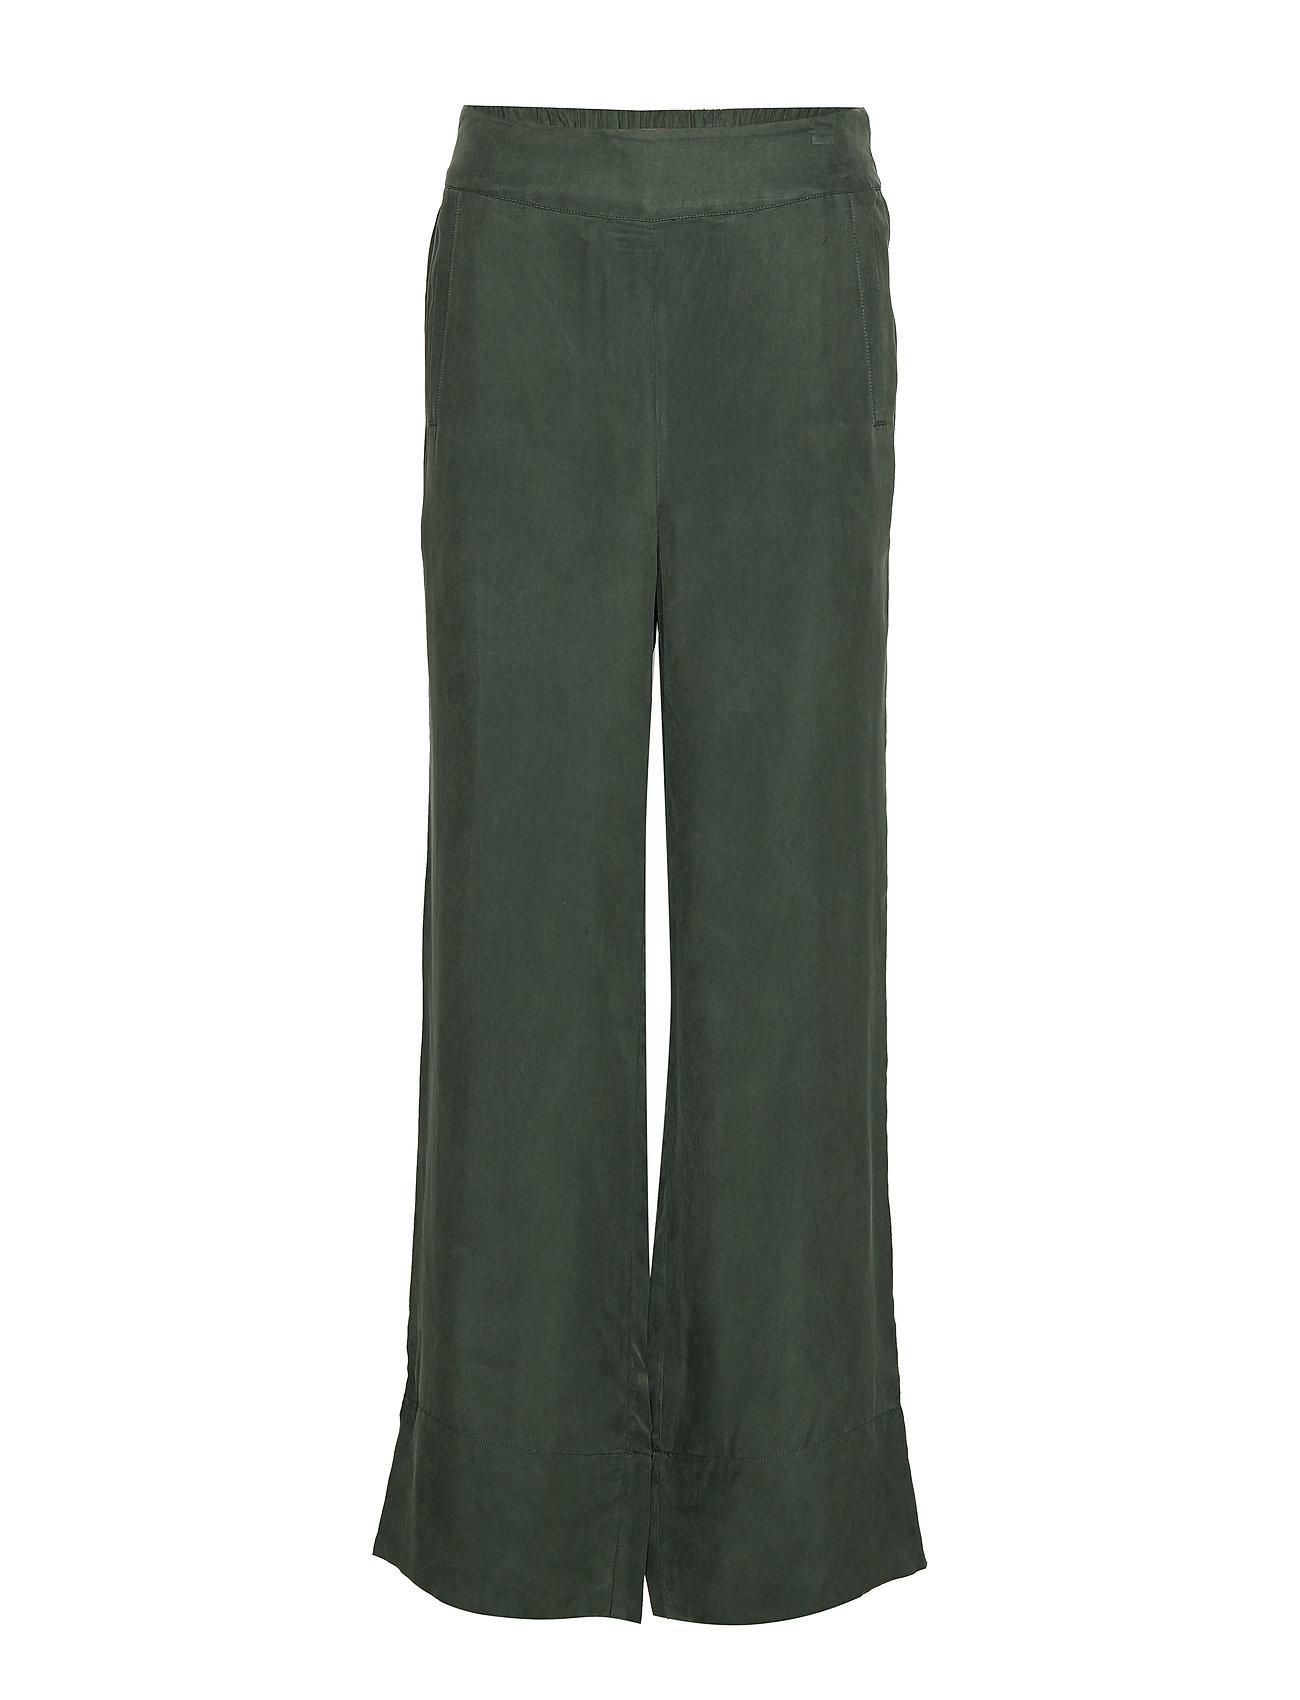 Rabens Saloner Solid matte wide leg pant - FOREST GREEN